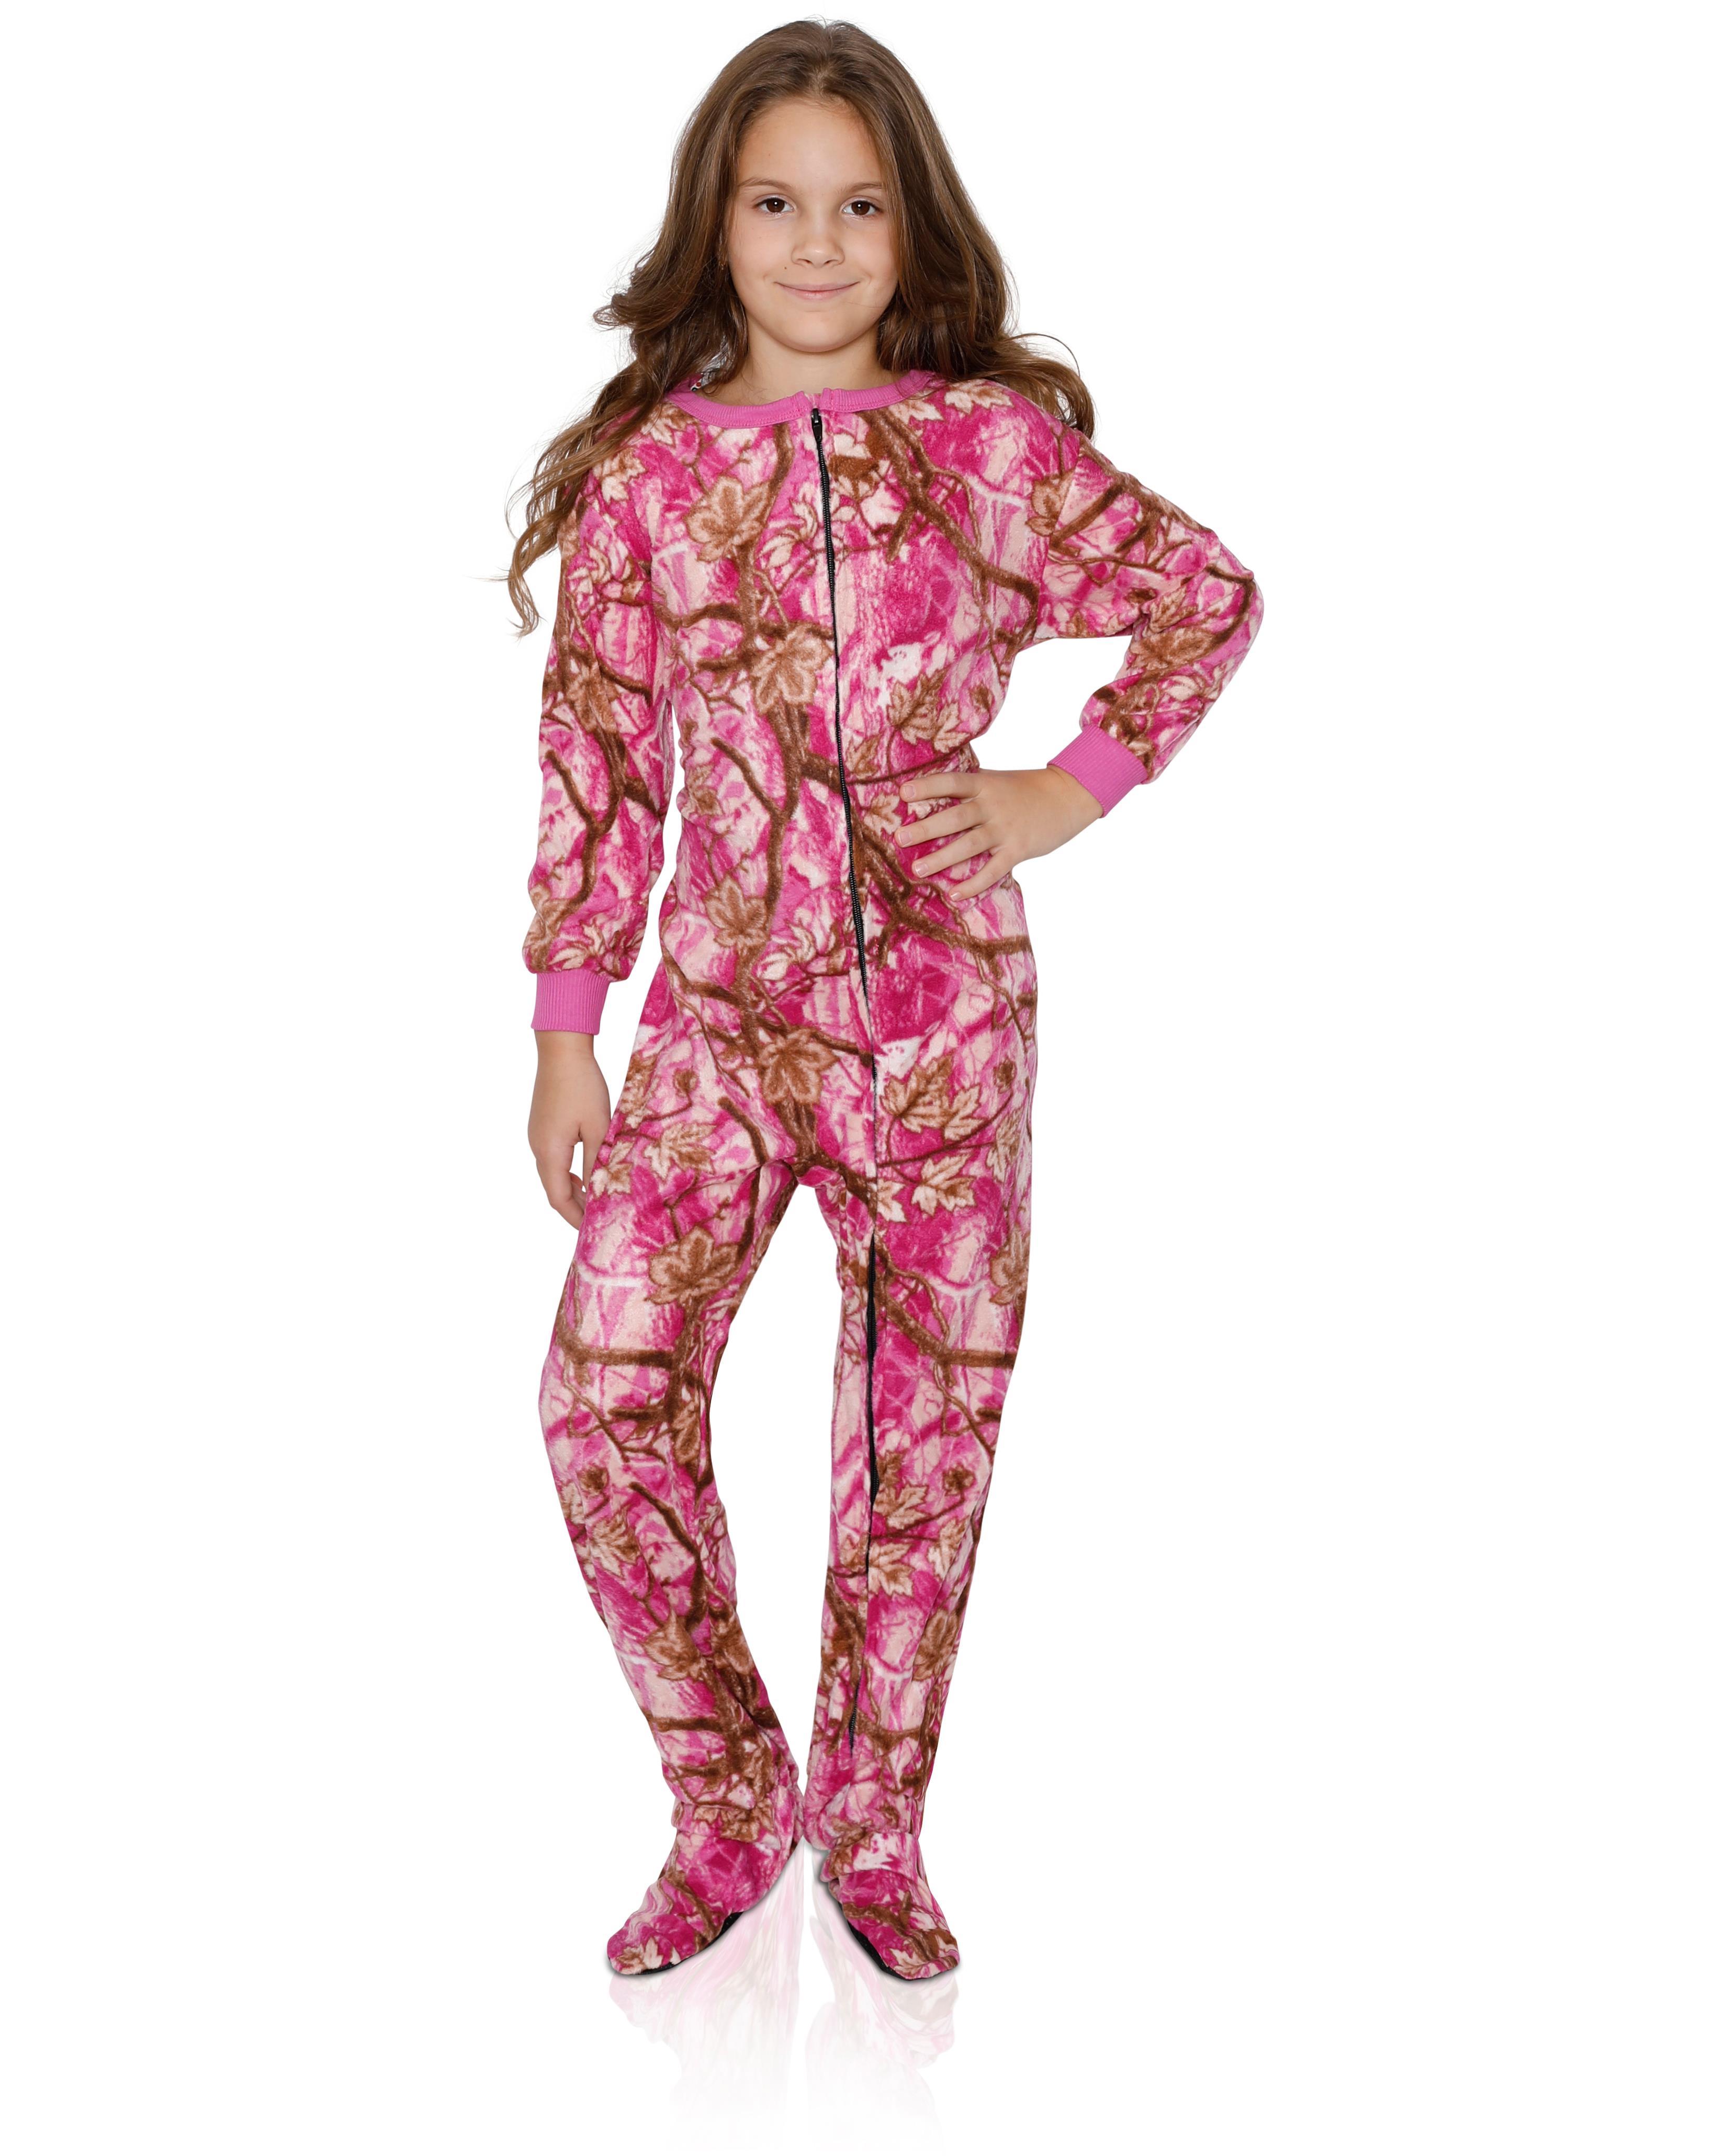 Emoji - FUN FOOTIES Camo Smiley Girls Footed Pajama Sleeper Onesie ... 08ae2148e